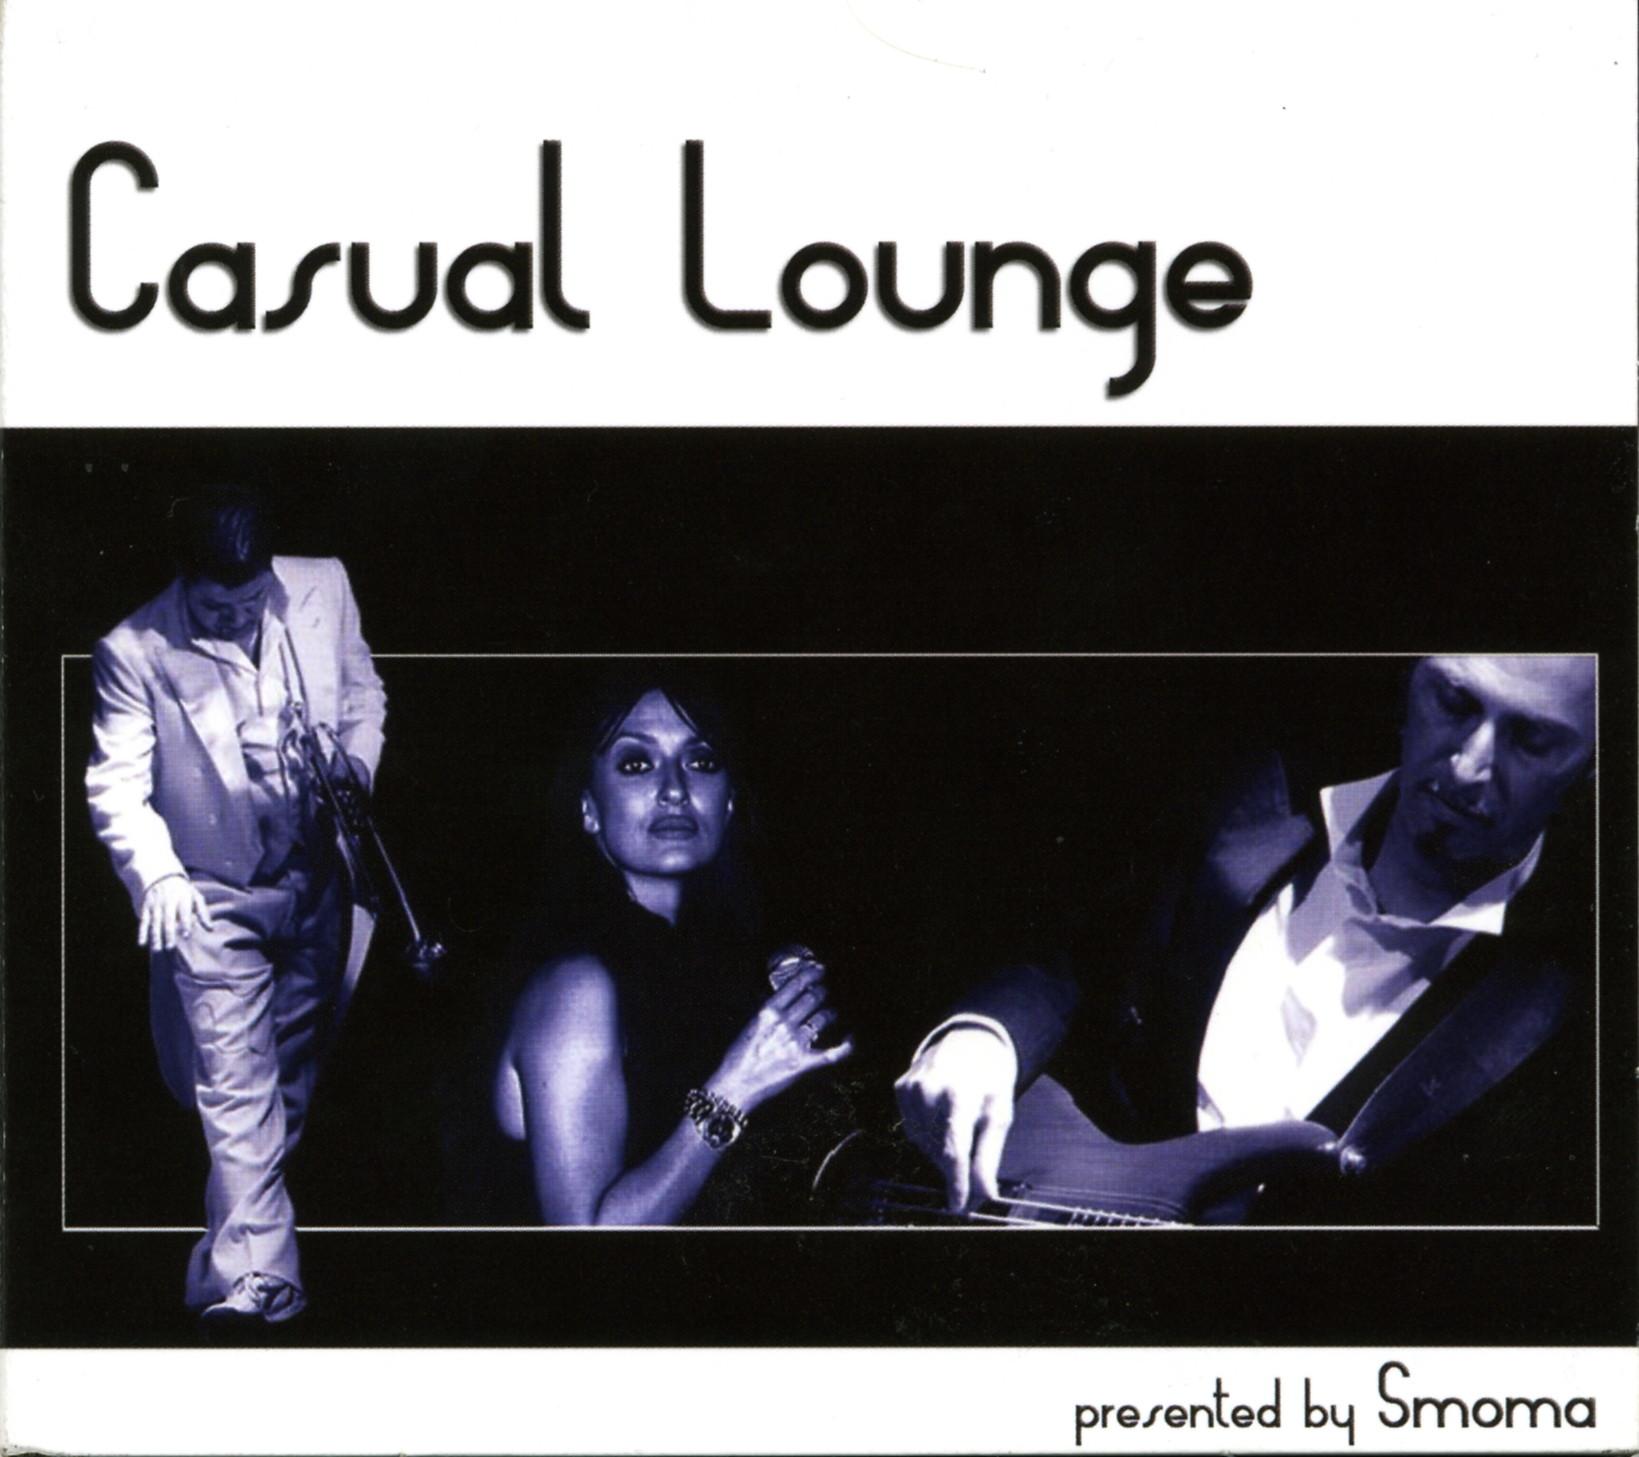 Smoma - Casual Lounge